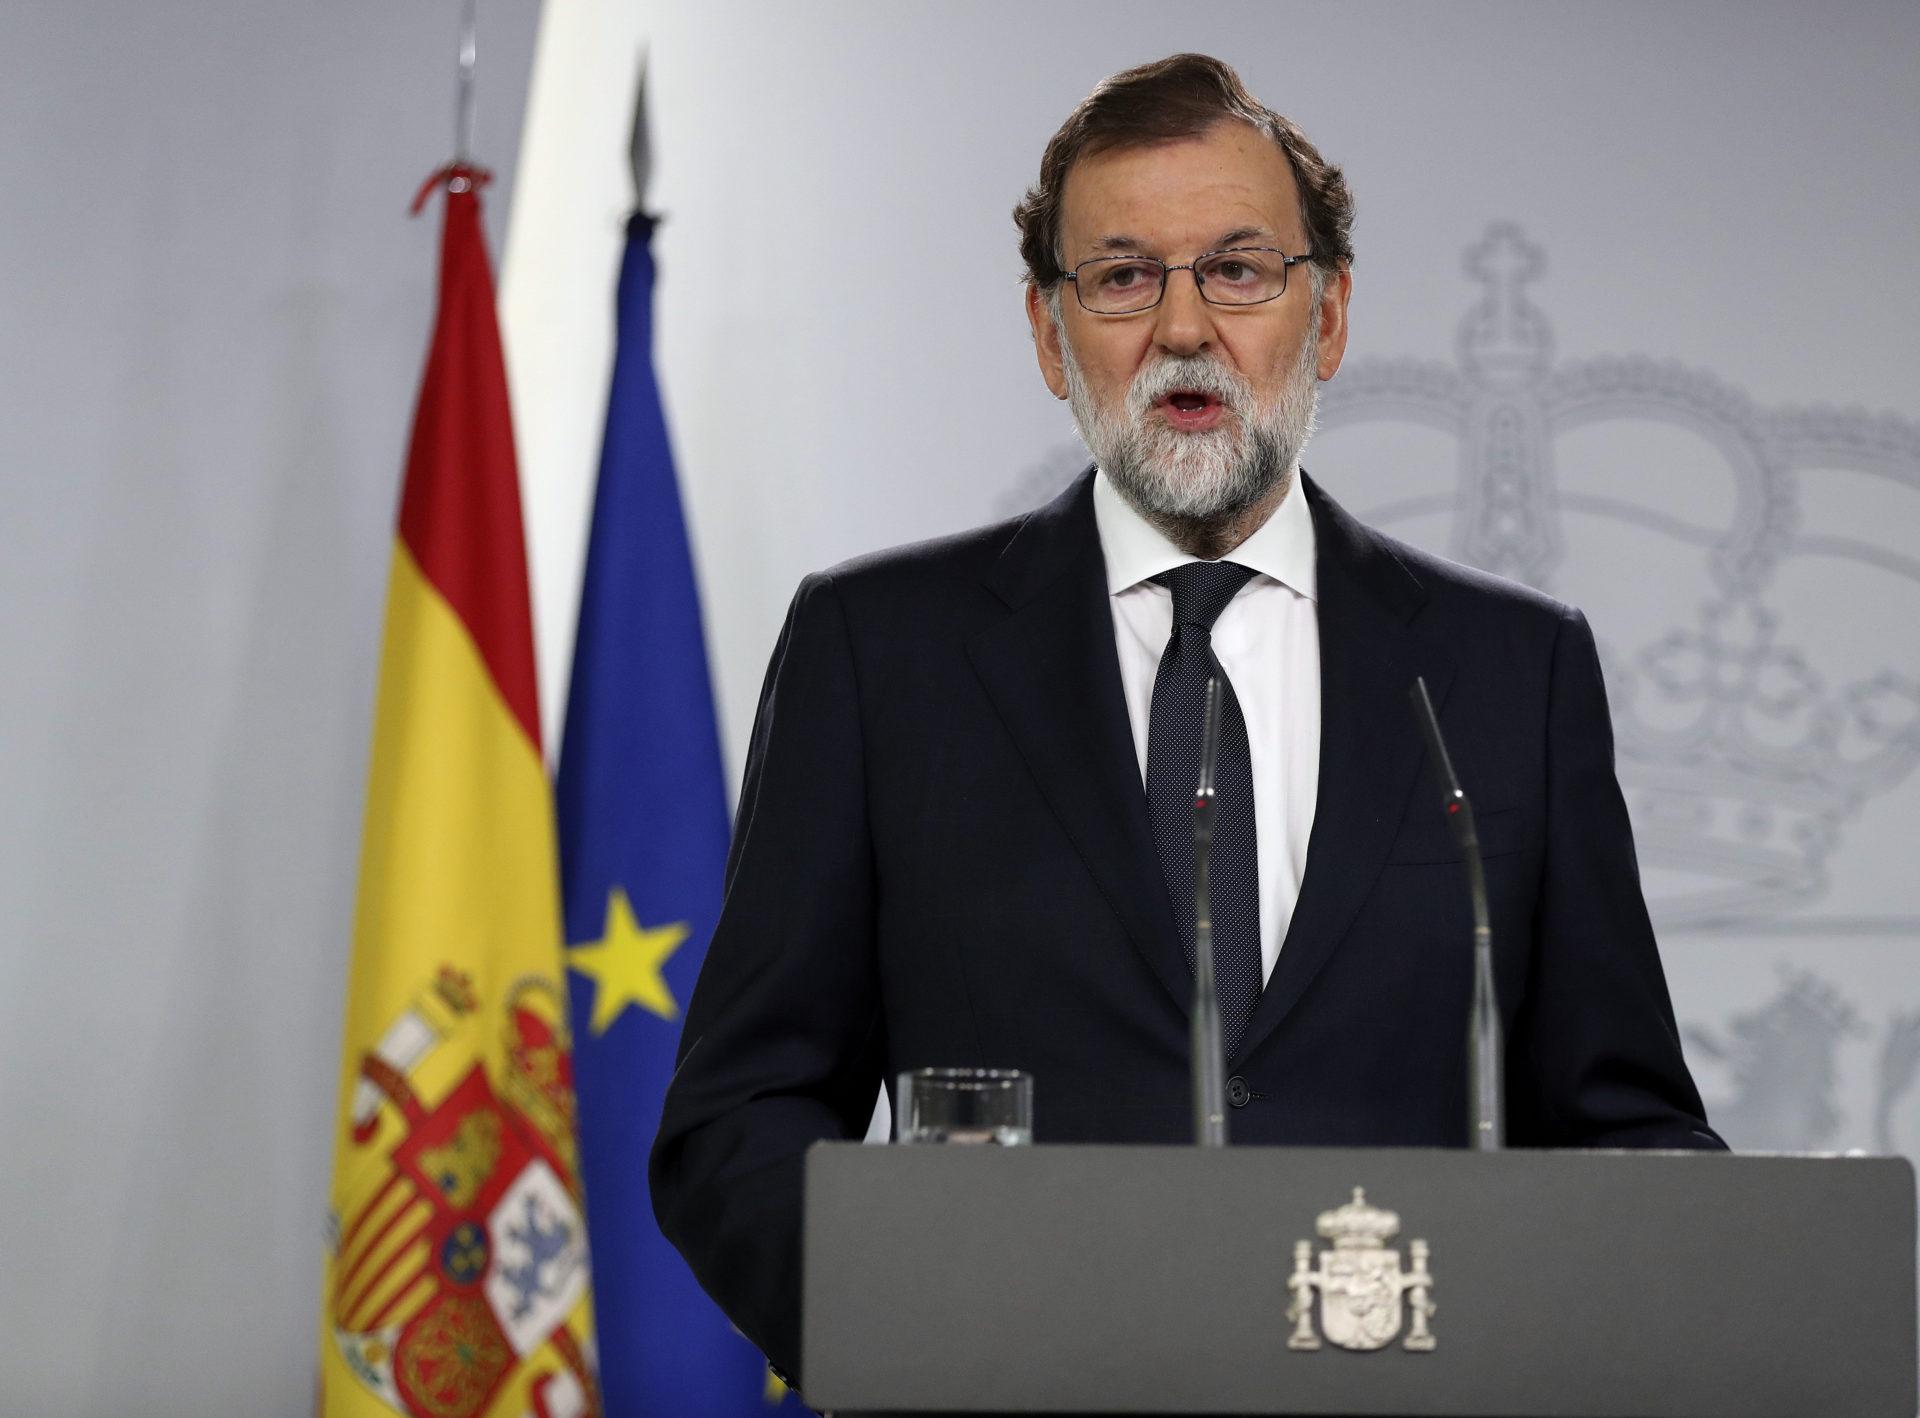 Mariano-Rajoy-Moncloa-referendum-efe-bbva